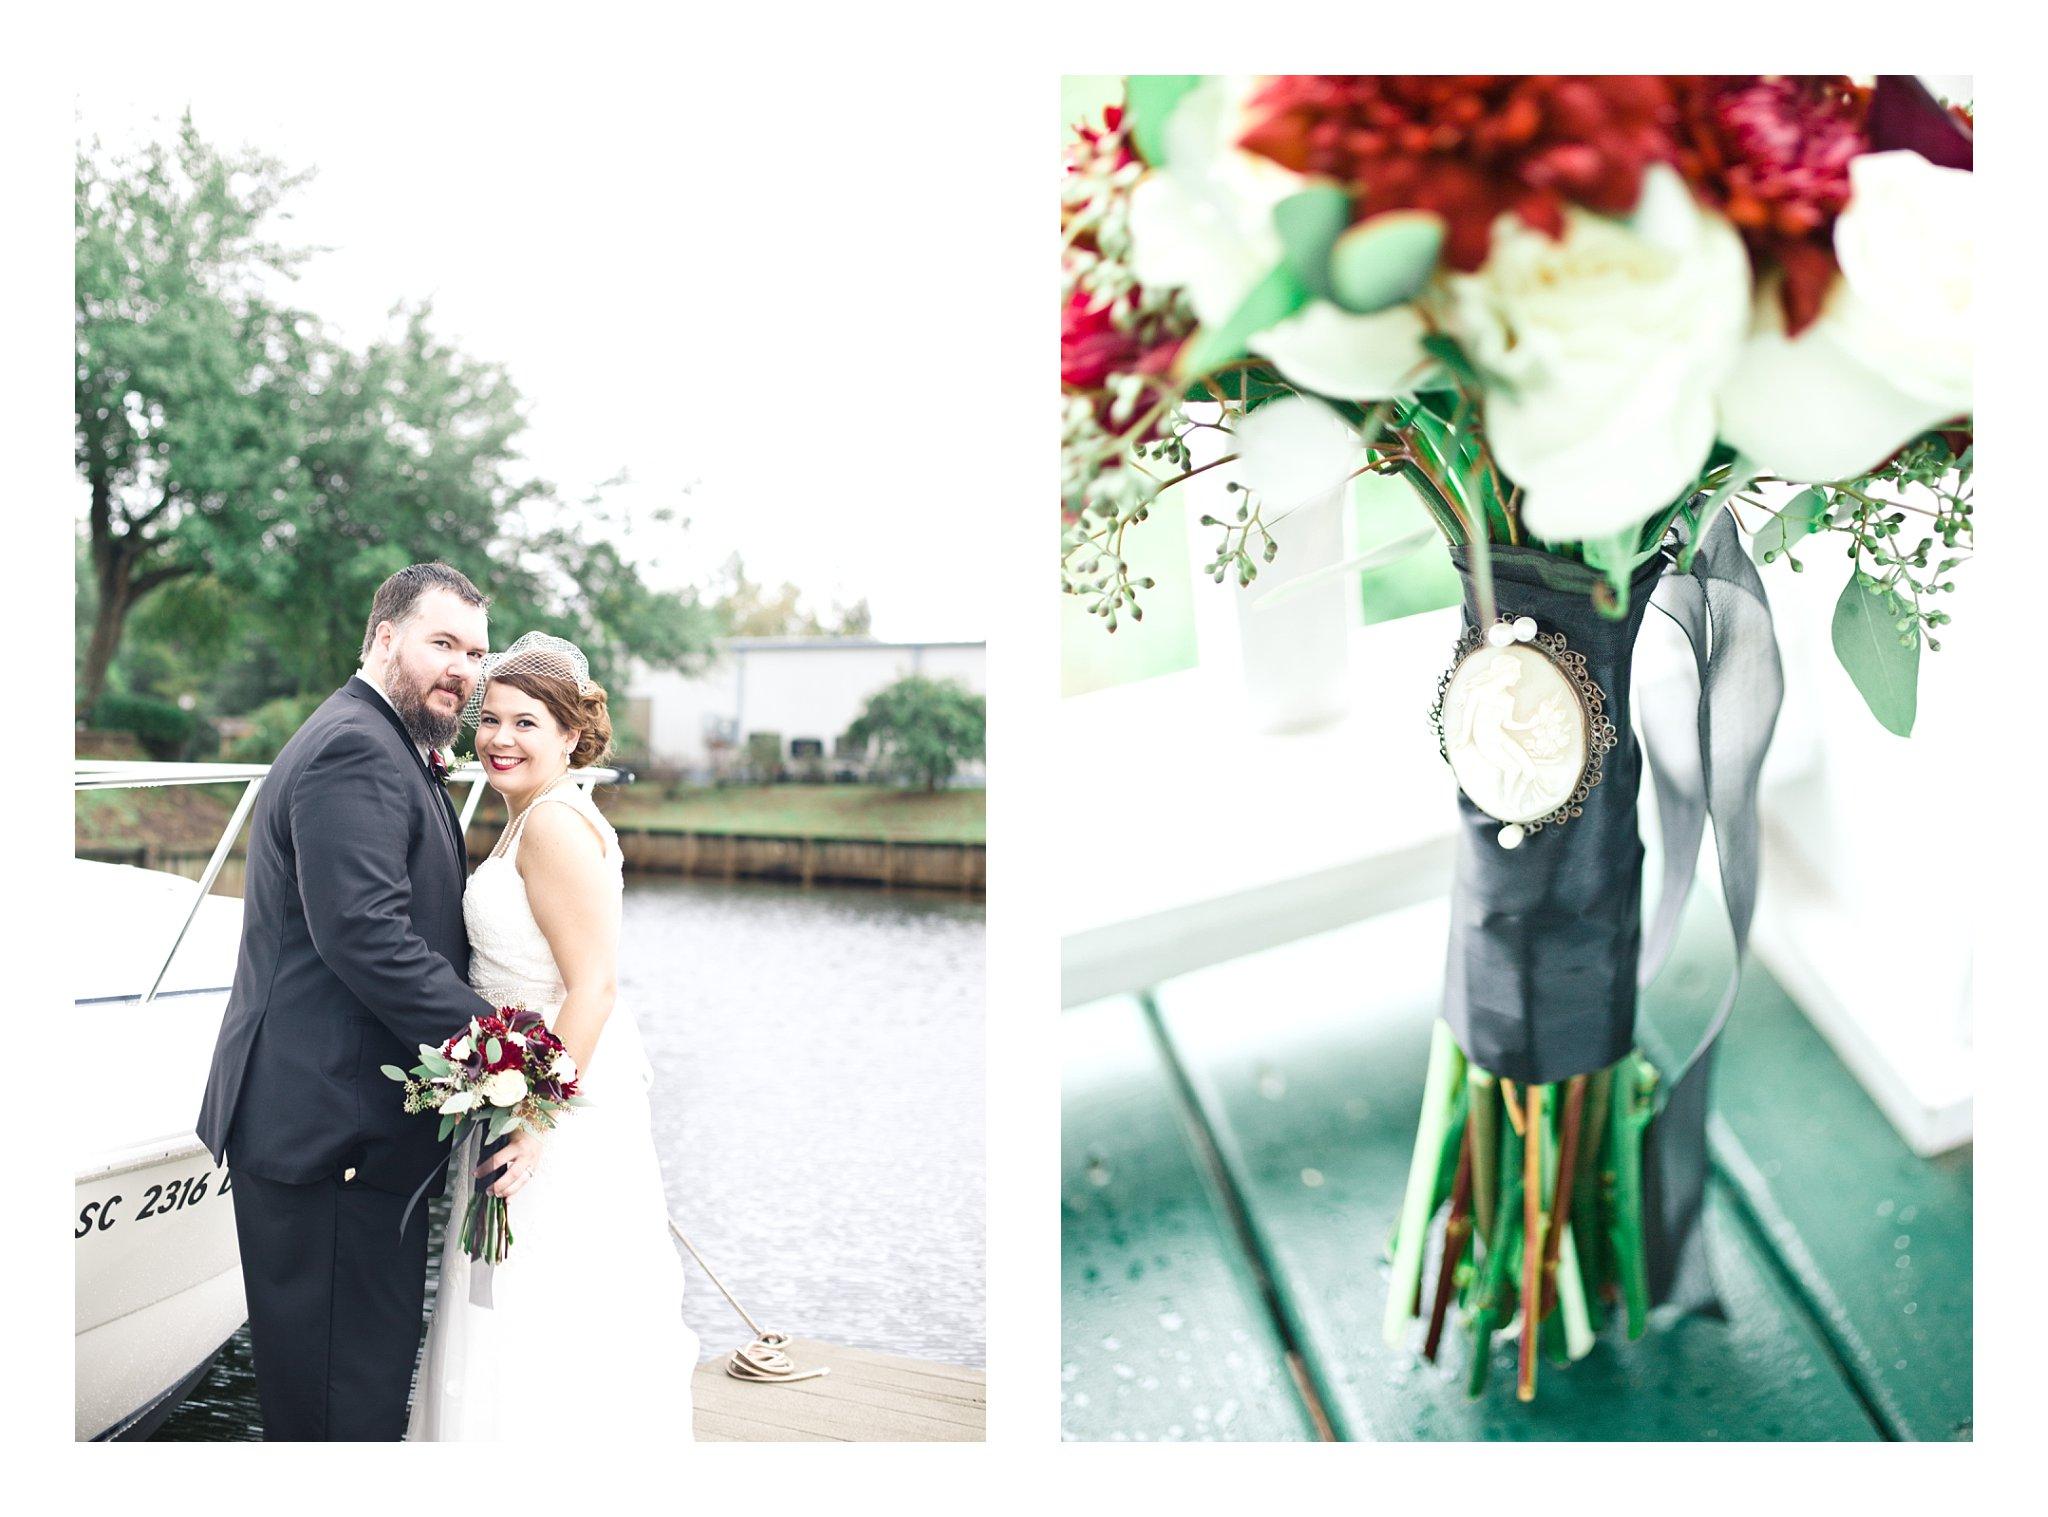 cypress-inn-garnet-black-lowcountry-vintage-wedding-conway-sc-photos_0142.jpg